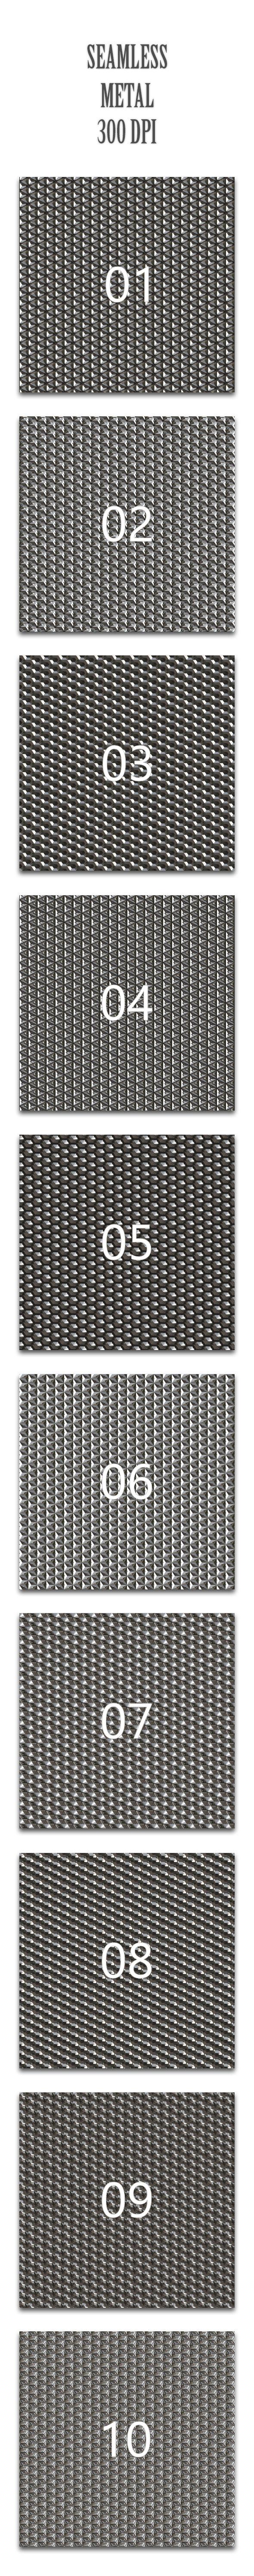 Seamless Metal - Textures / Fills / Patterns Photoshop